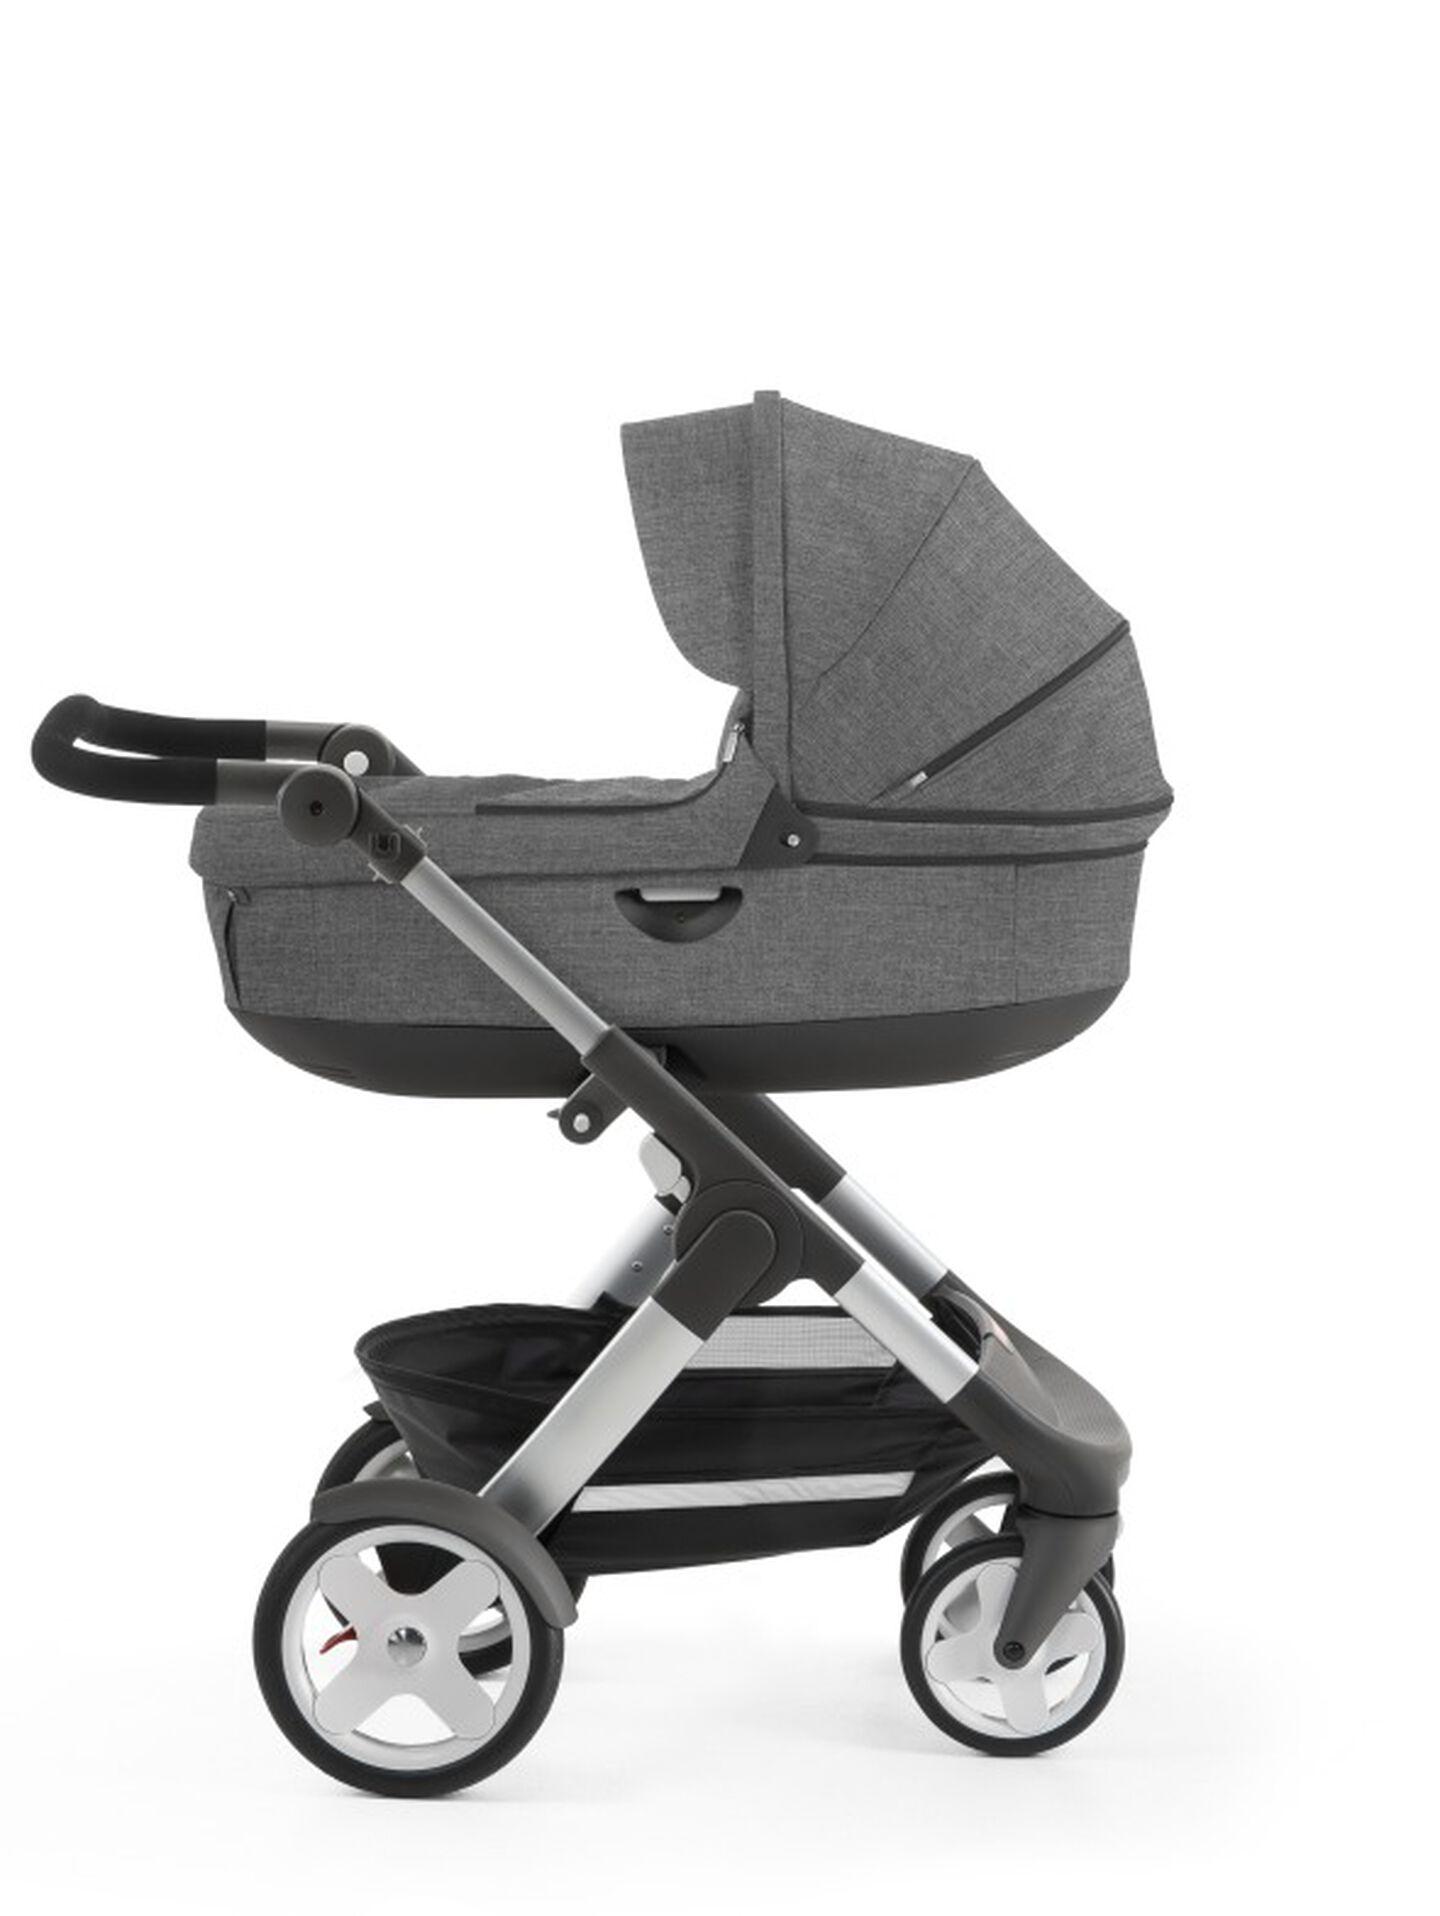 Stokke® Trailz™ with Stokke® Stroller Carry Cot, Black Melange. Classic Wheels. view 2